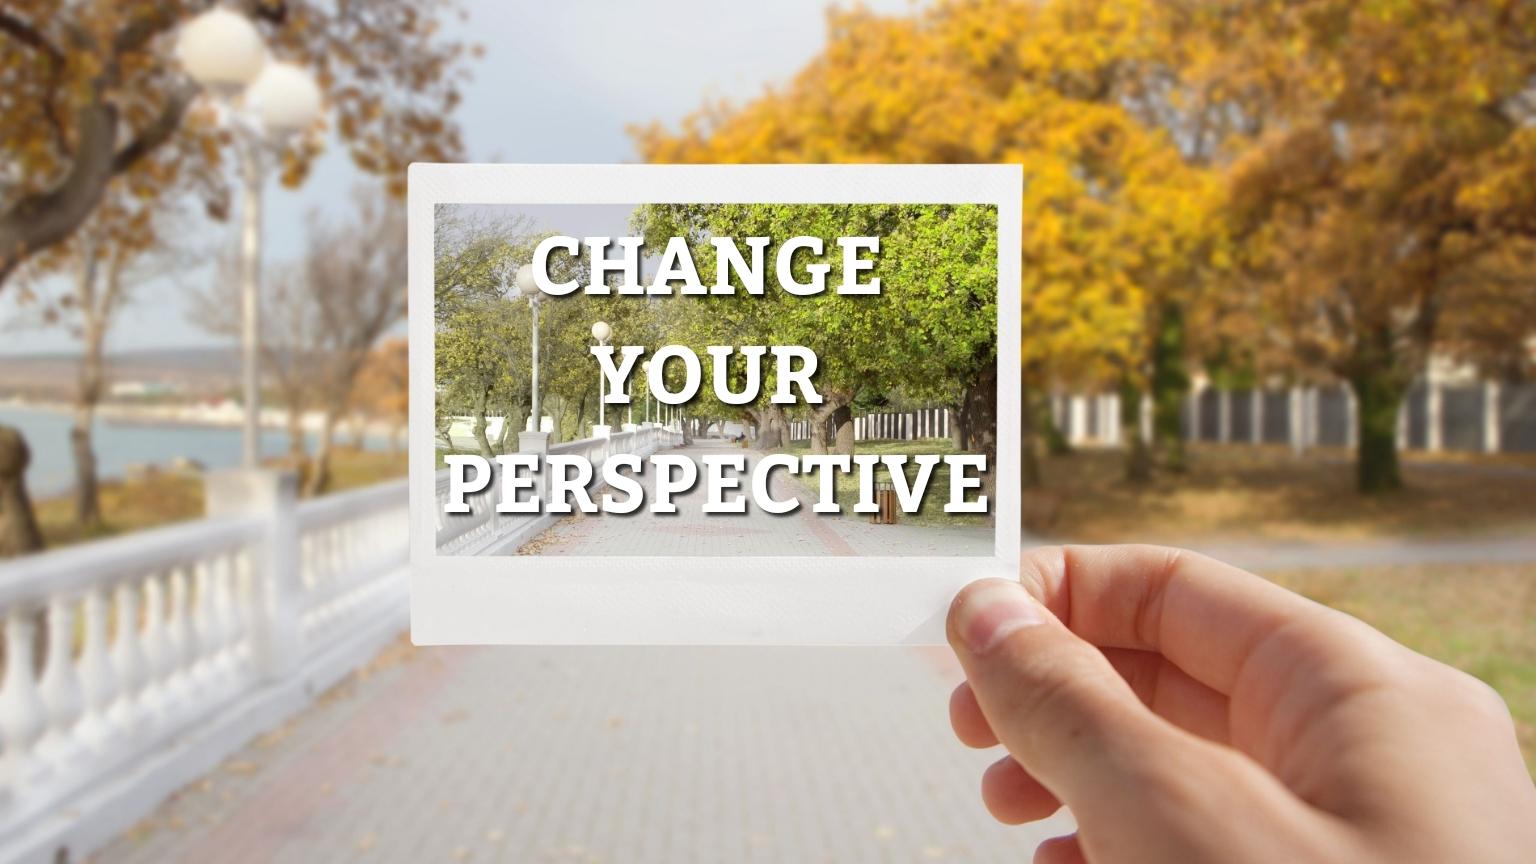 change your perspective 08.25.19.jpg